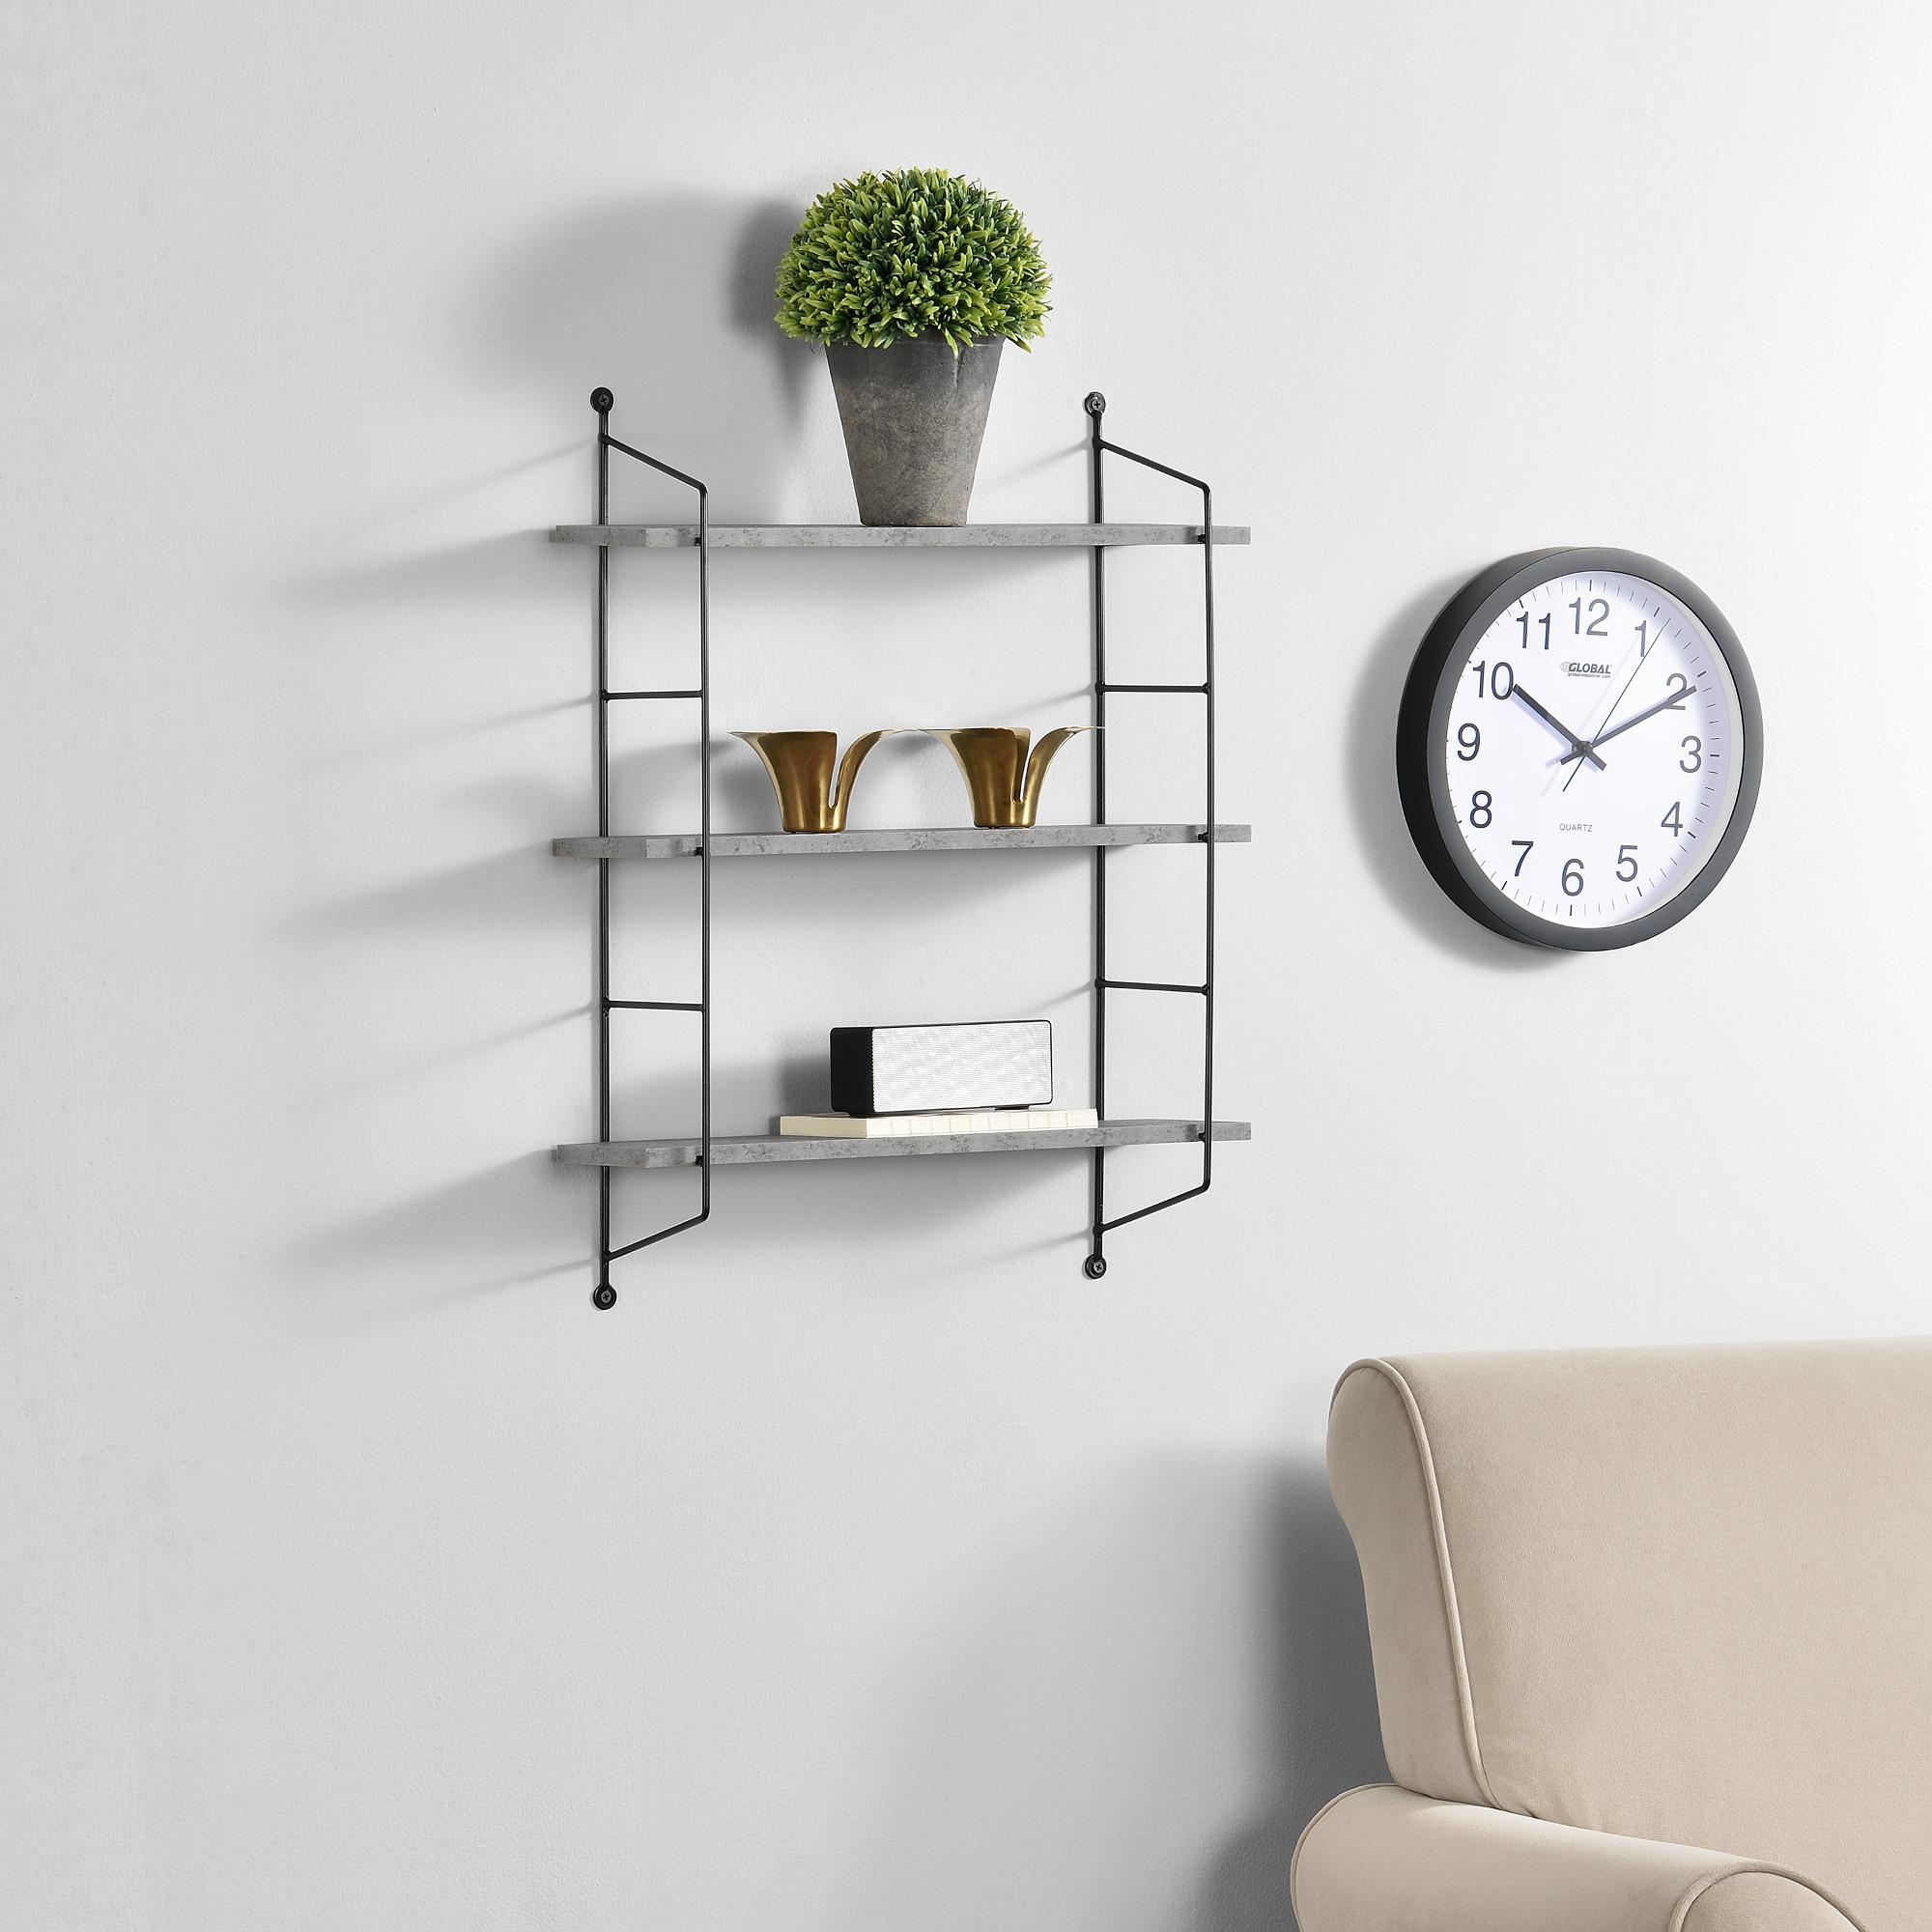 wandregal h ngeregal wandboard deko regal board. Black Bedroom Furniture Sets. Home Design Ideas